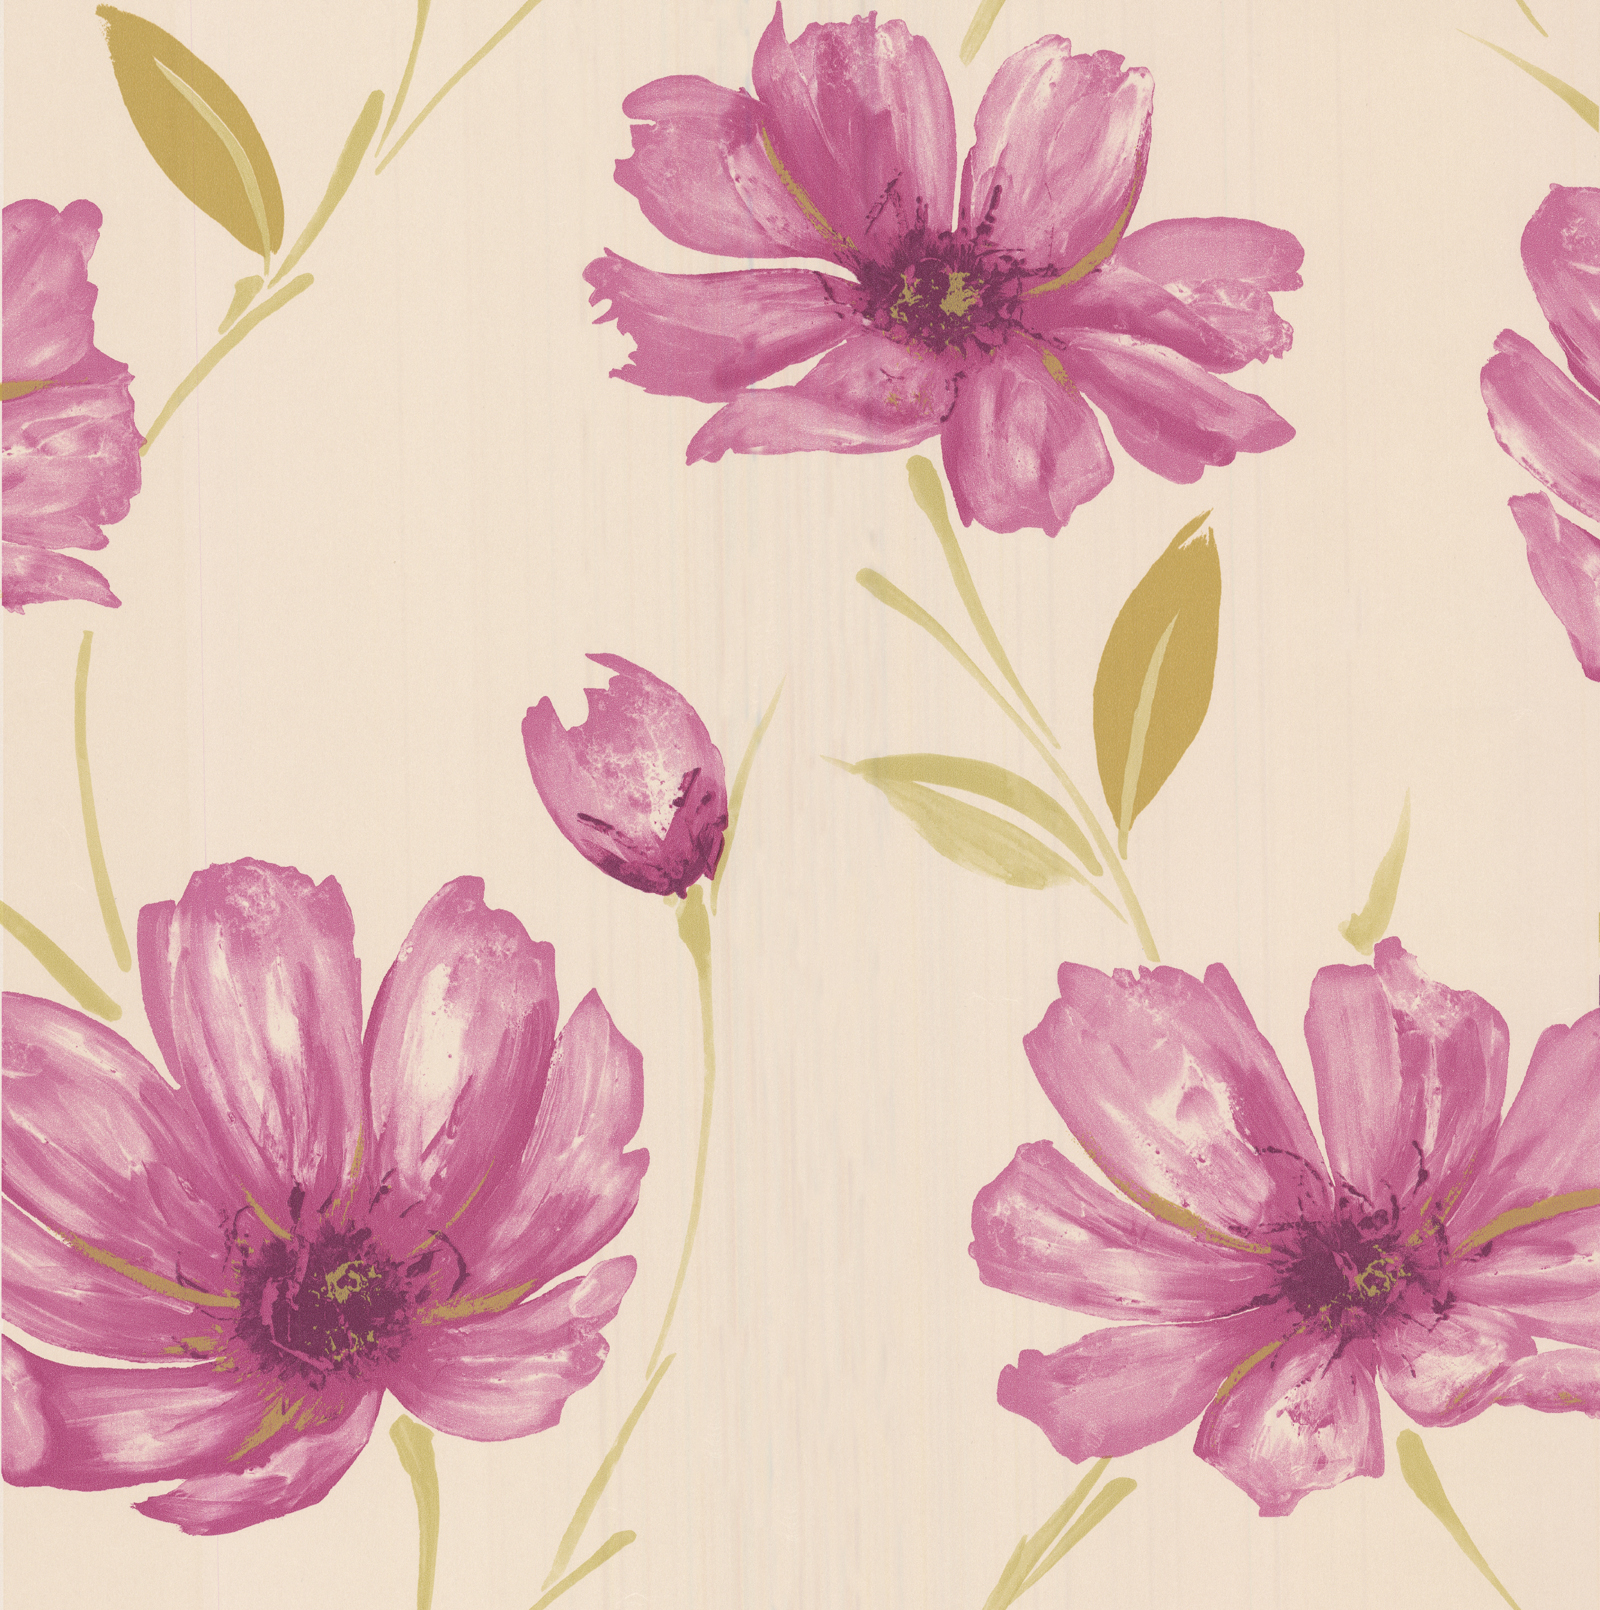 Stylish Wallpaper for Home - WallpaperSafari